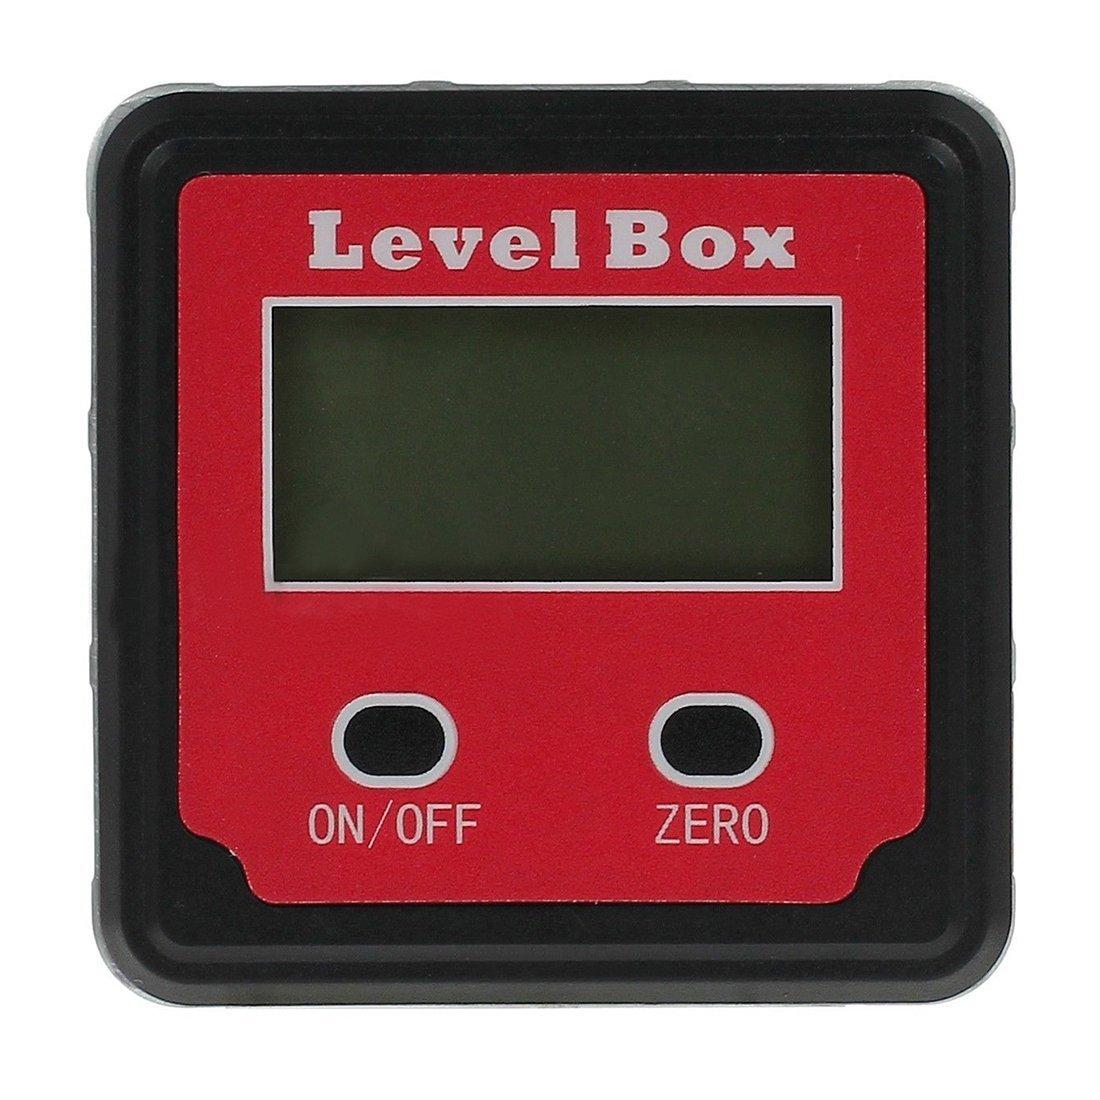 Bevel Box - TOOGOO(R) Digital Gauge Angle Protractor Finder Clinometer Bevel Box Magnetic Waterproof New